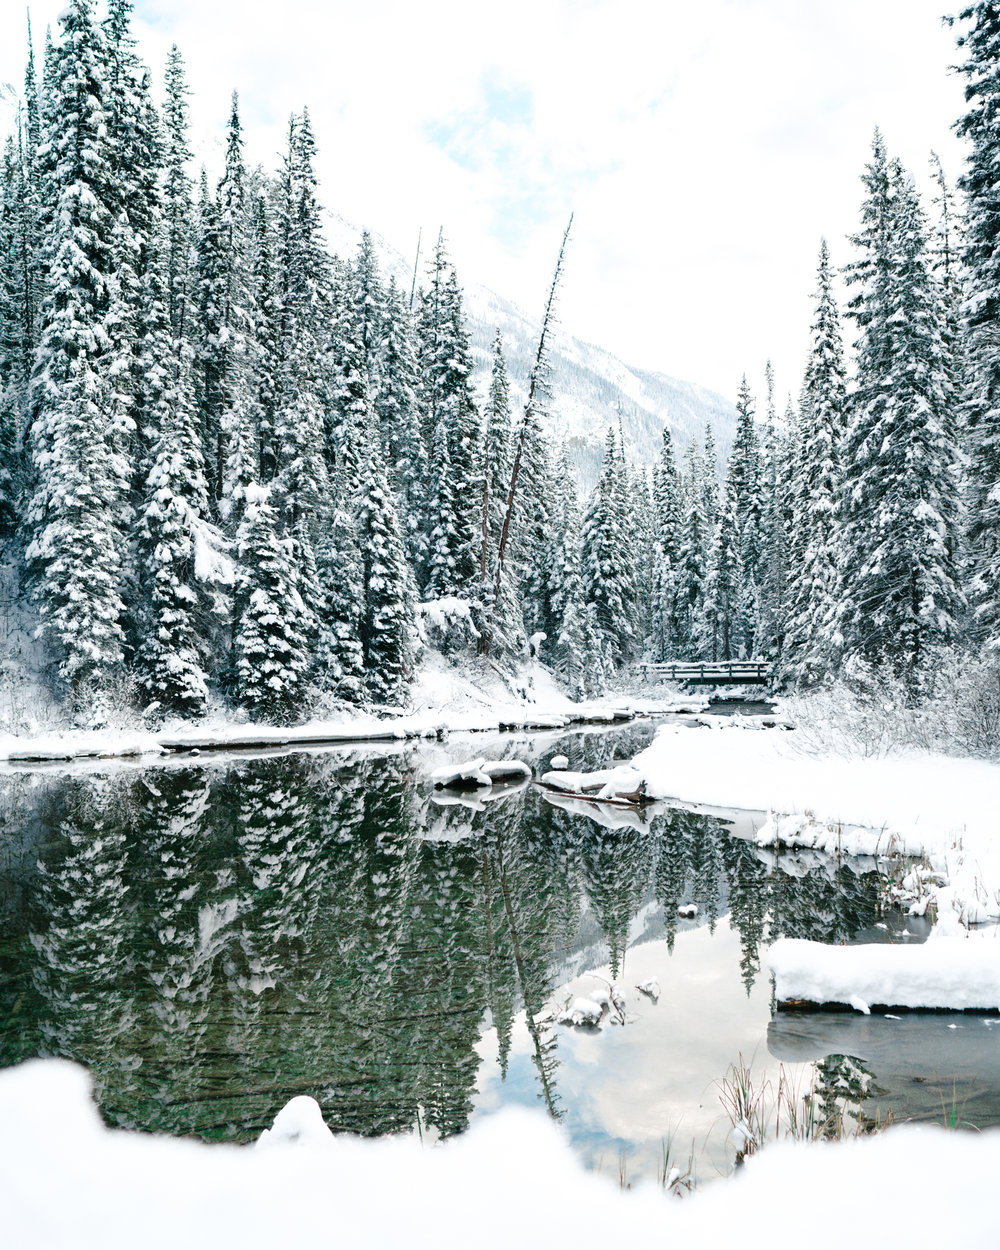 Winter Travel in Banff National Park